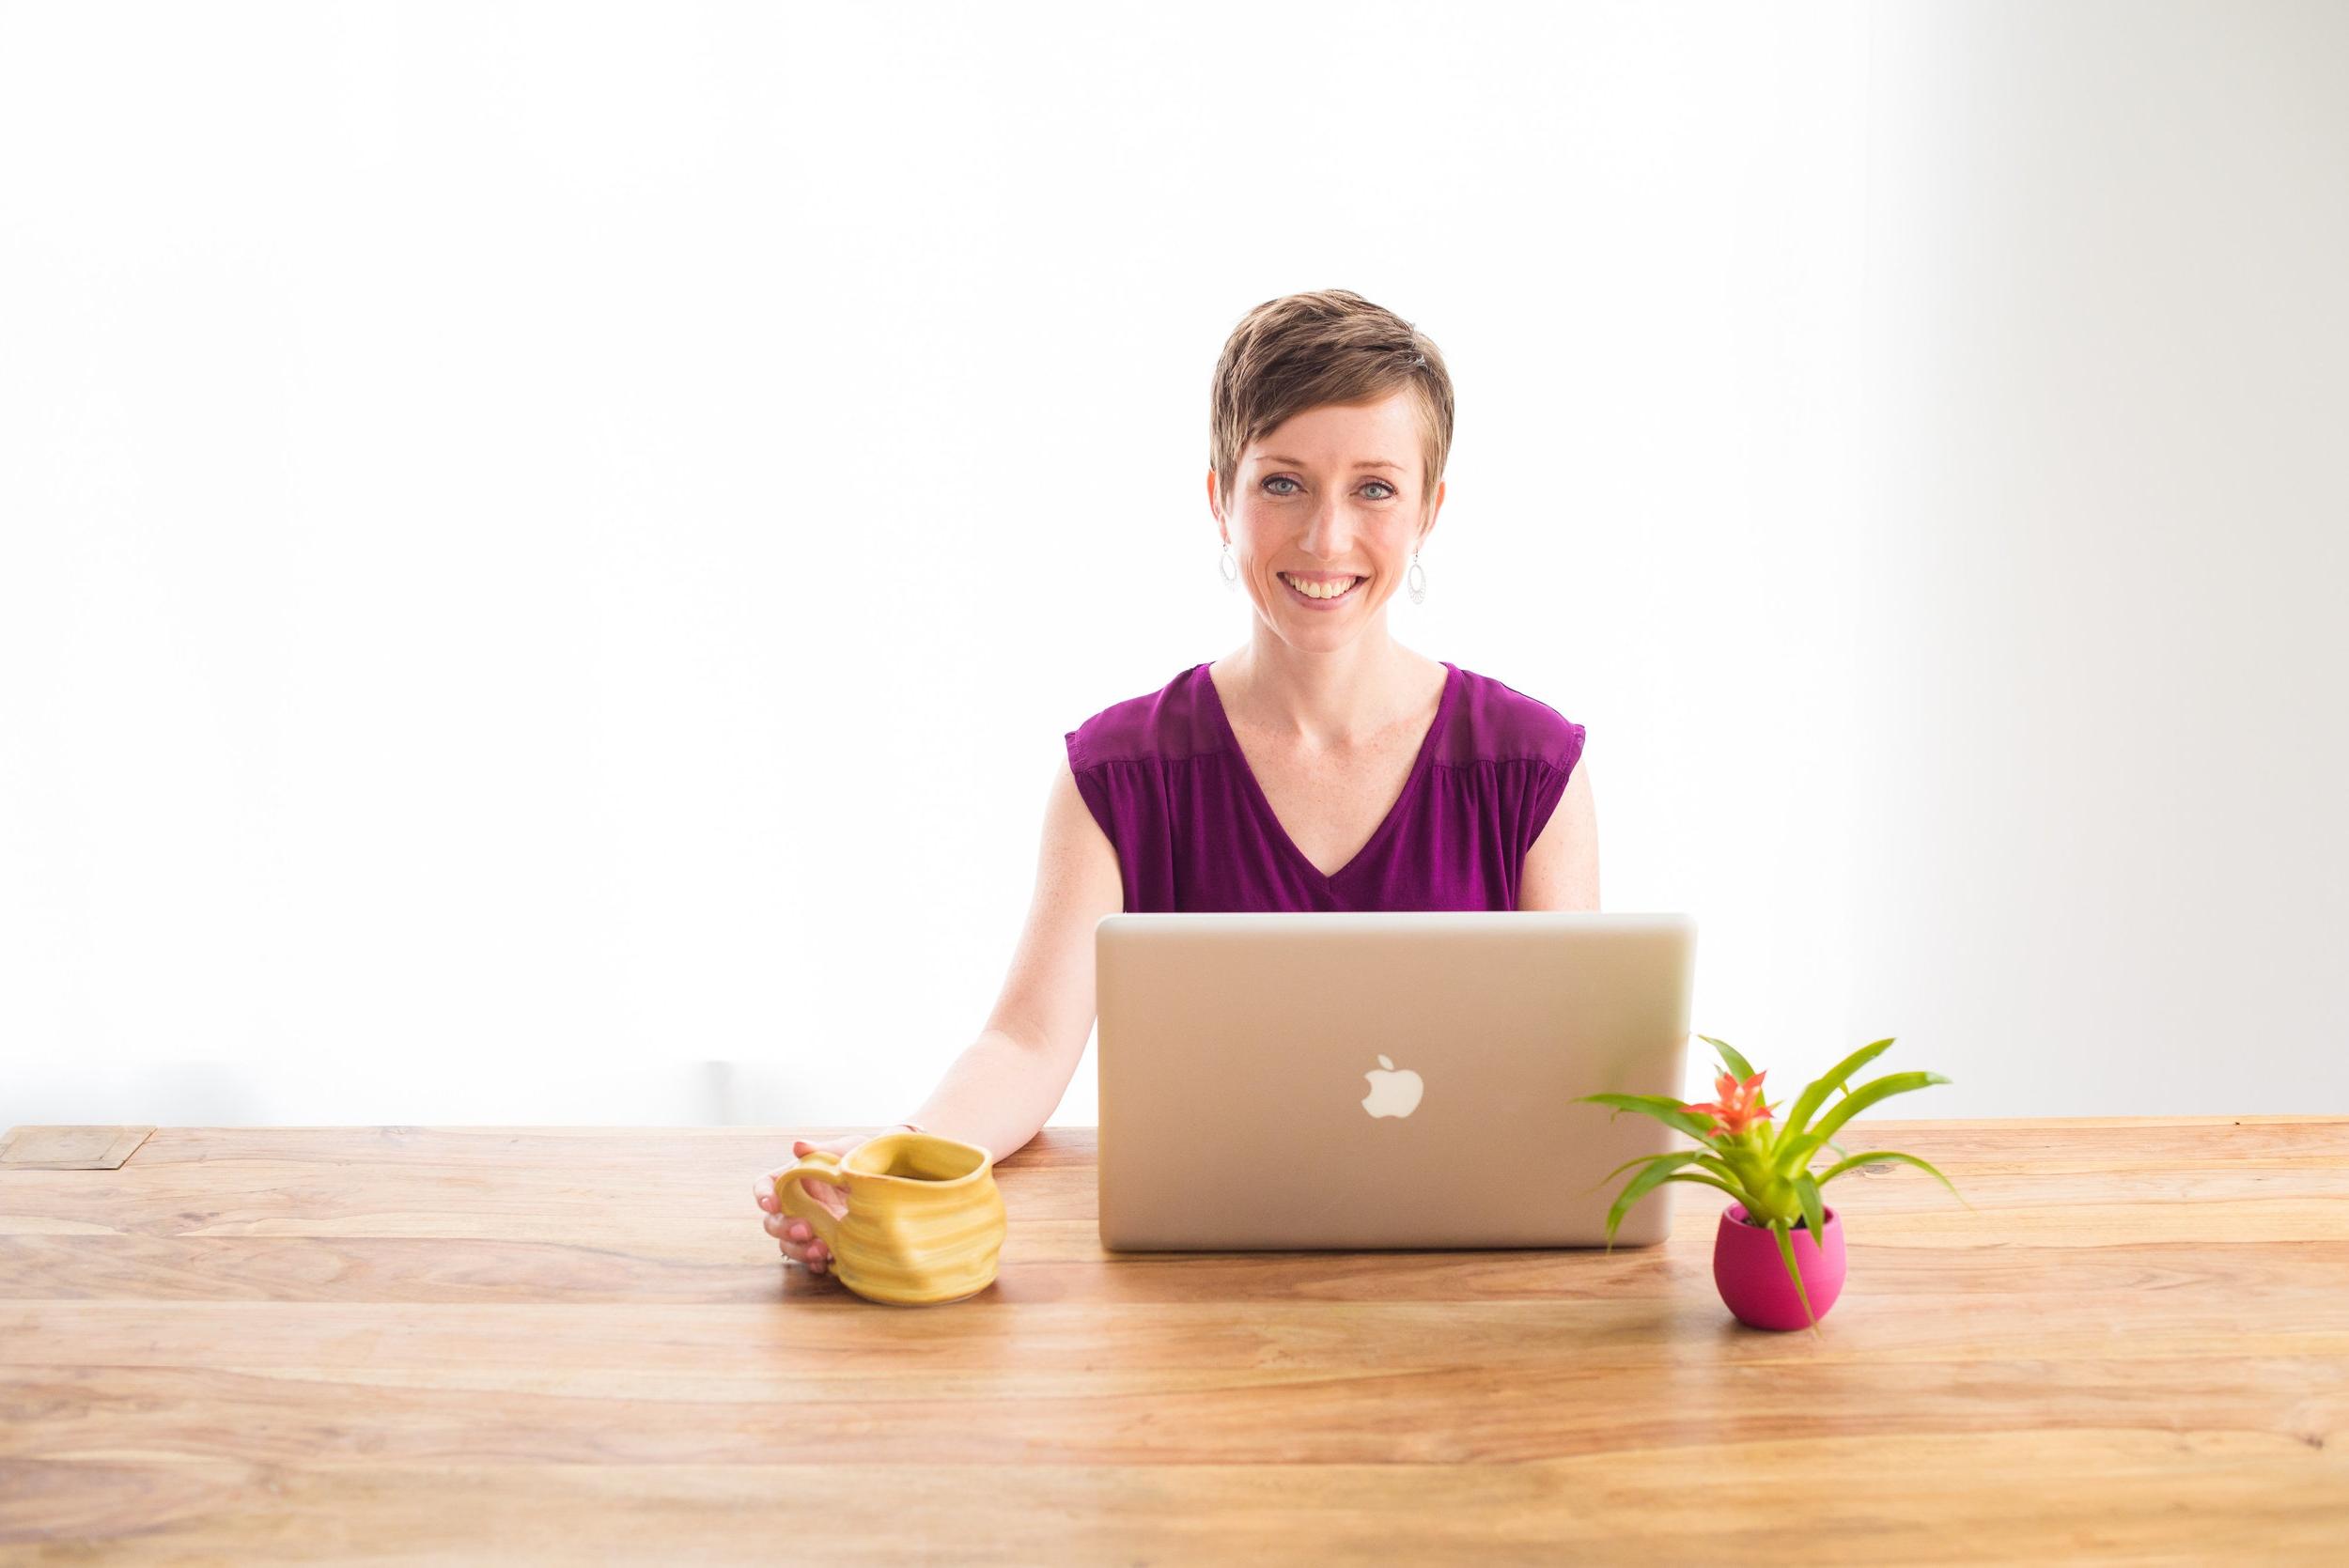 Horizontal - desk, hand on mug.jpg